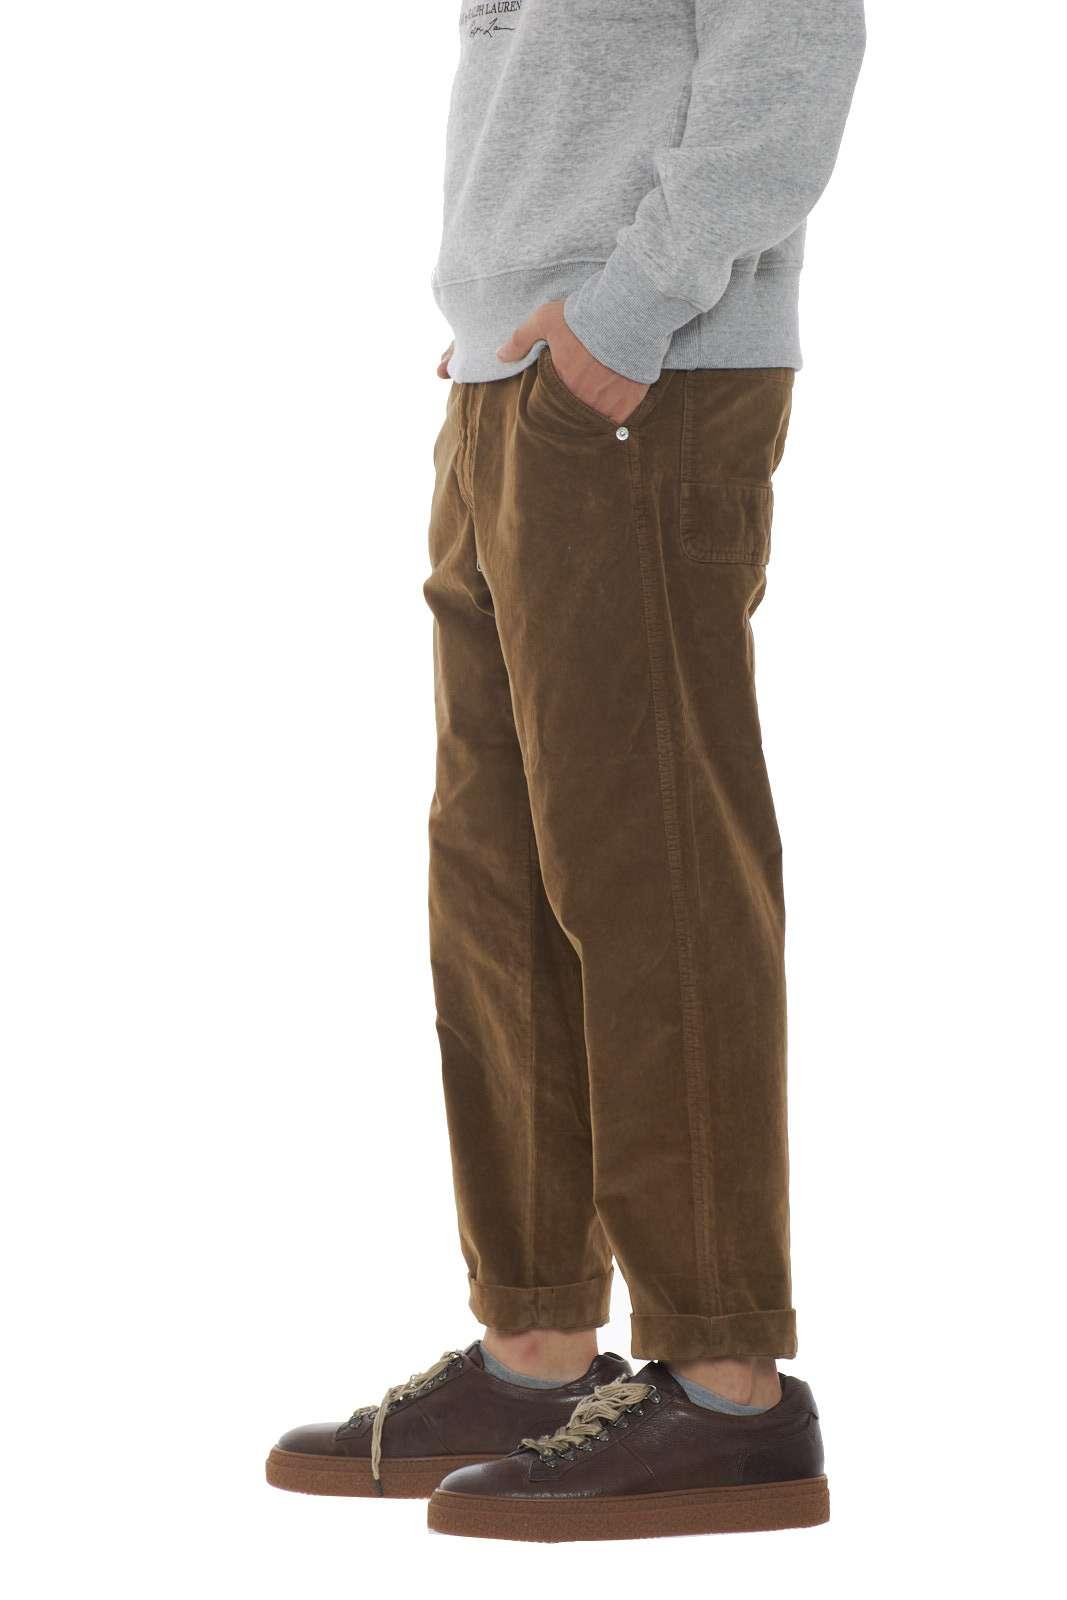 https://www.parmax.com/media/catalog/product/a/i/AI-outlet_parmax-pantaloni-uomo-Diesel-00SZKX0JAT-B_1.jpg